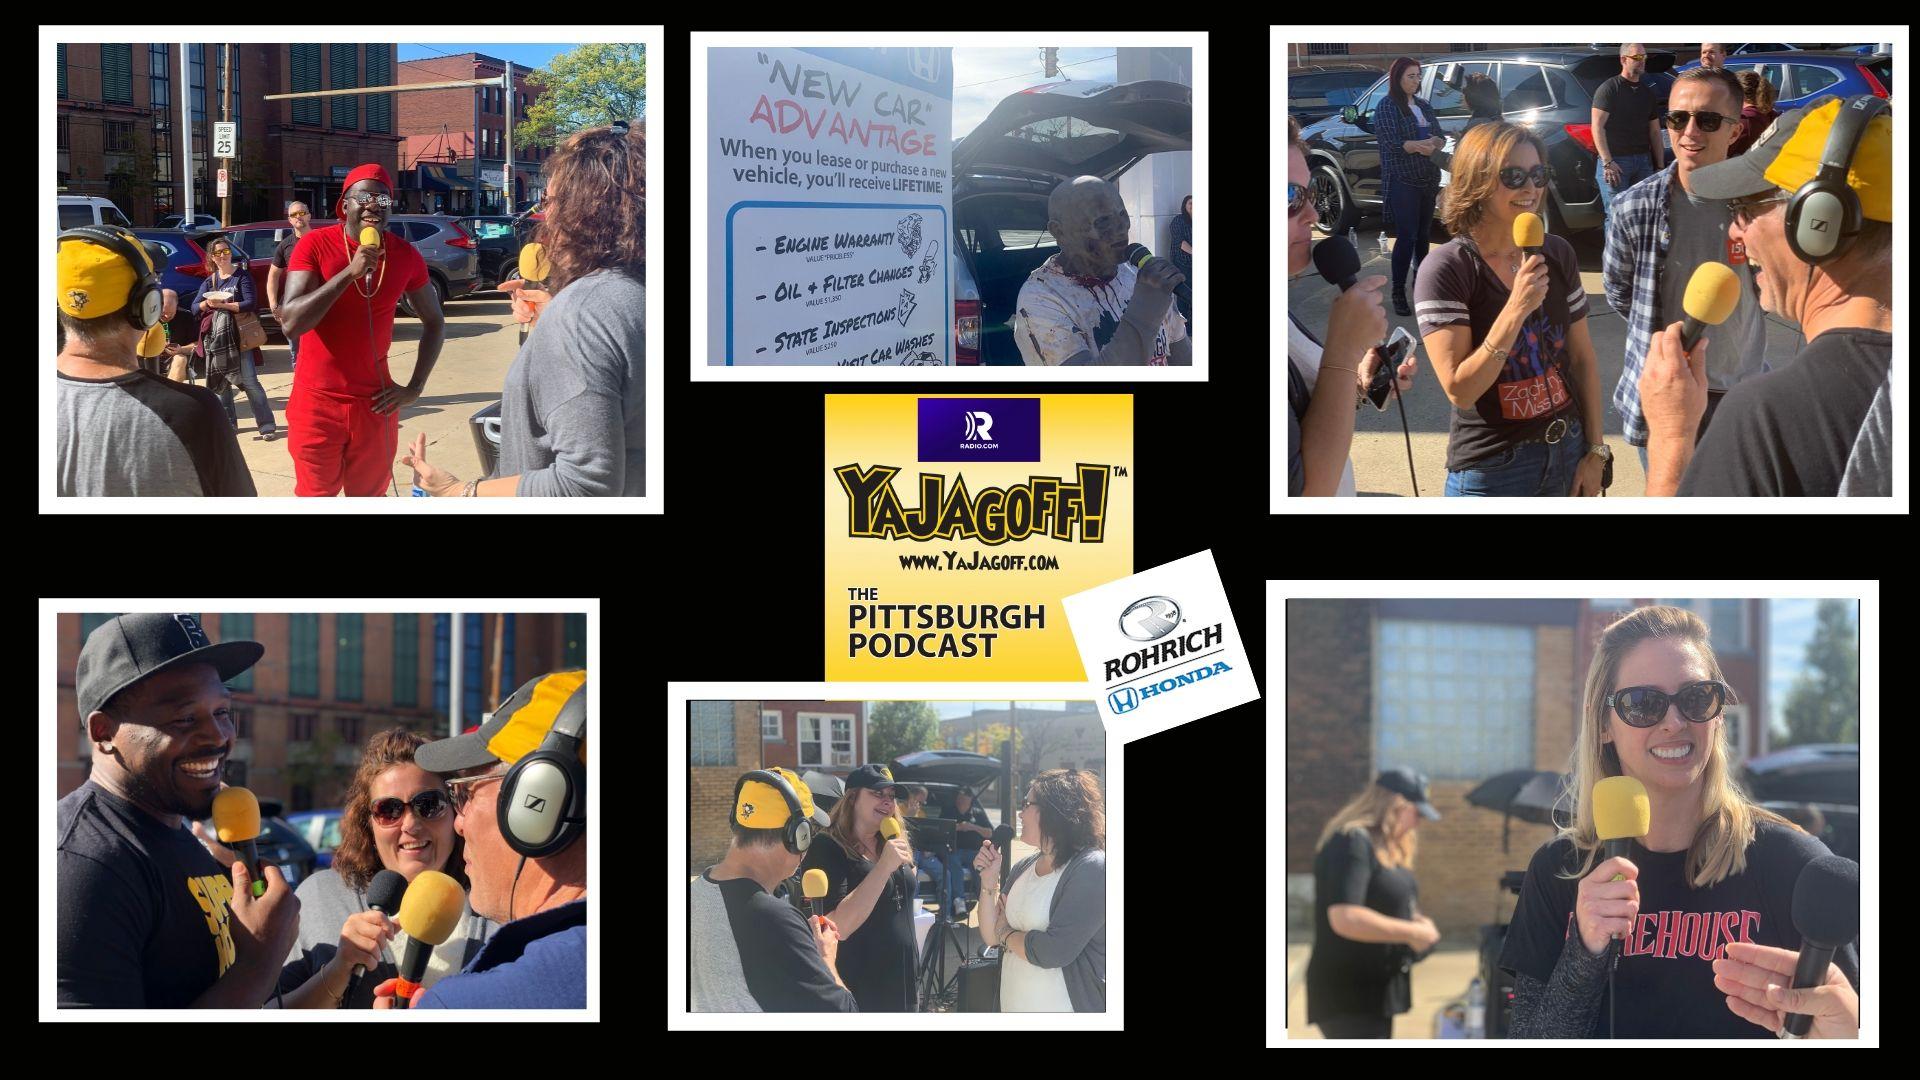 YaJagoff Podcast Frzy